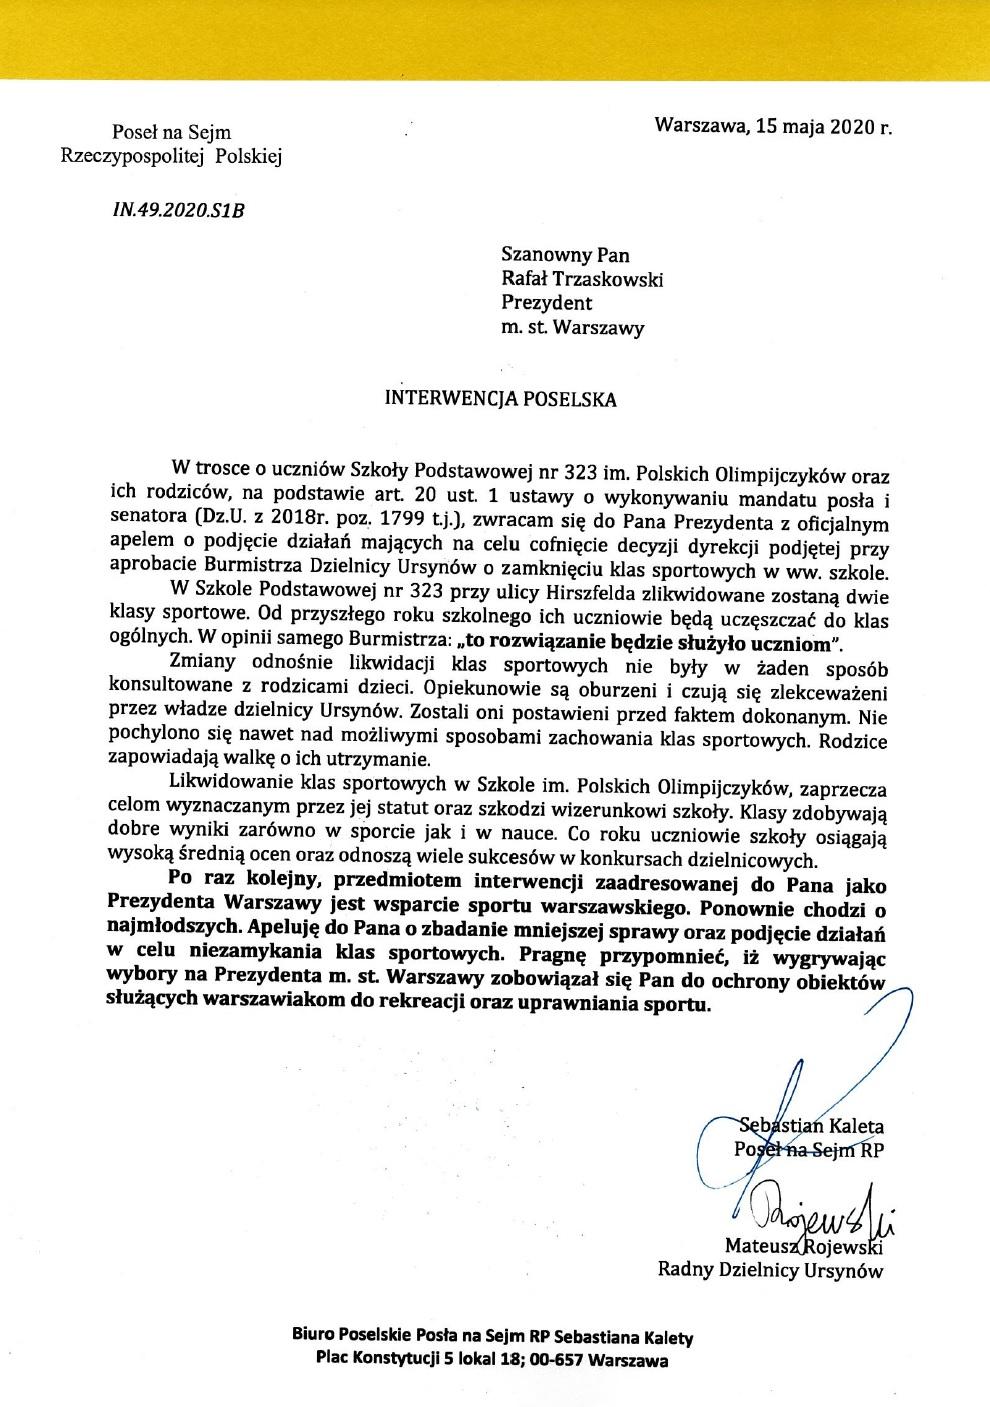 WarszawaML_pismo